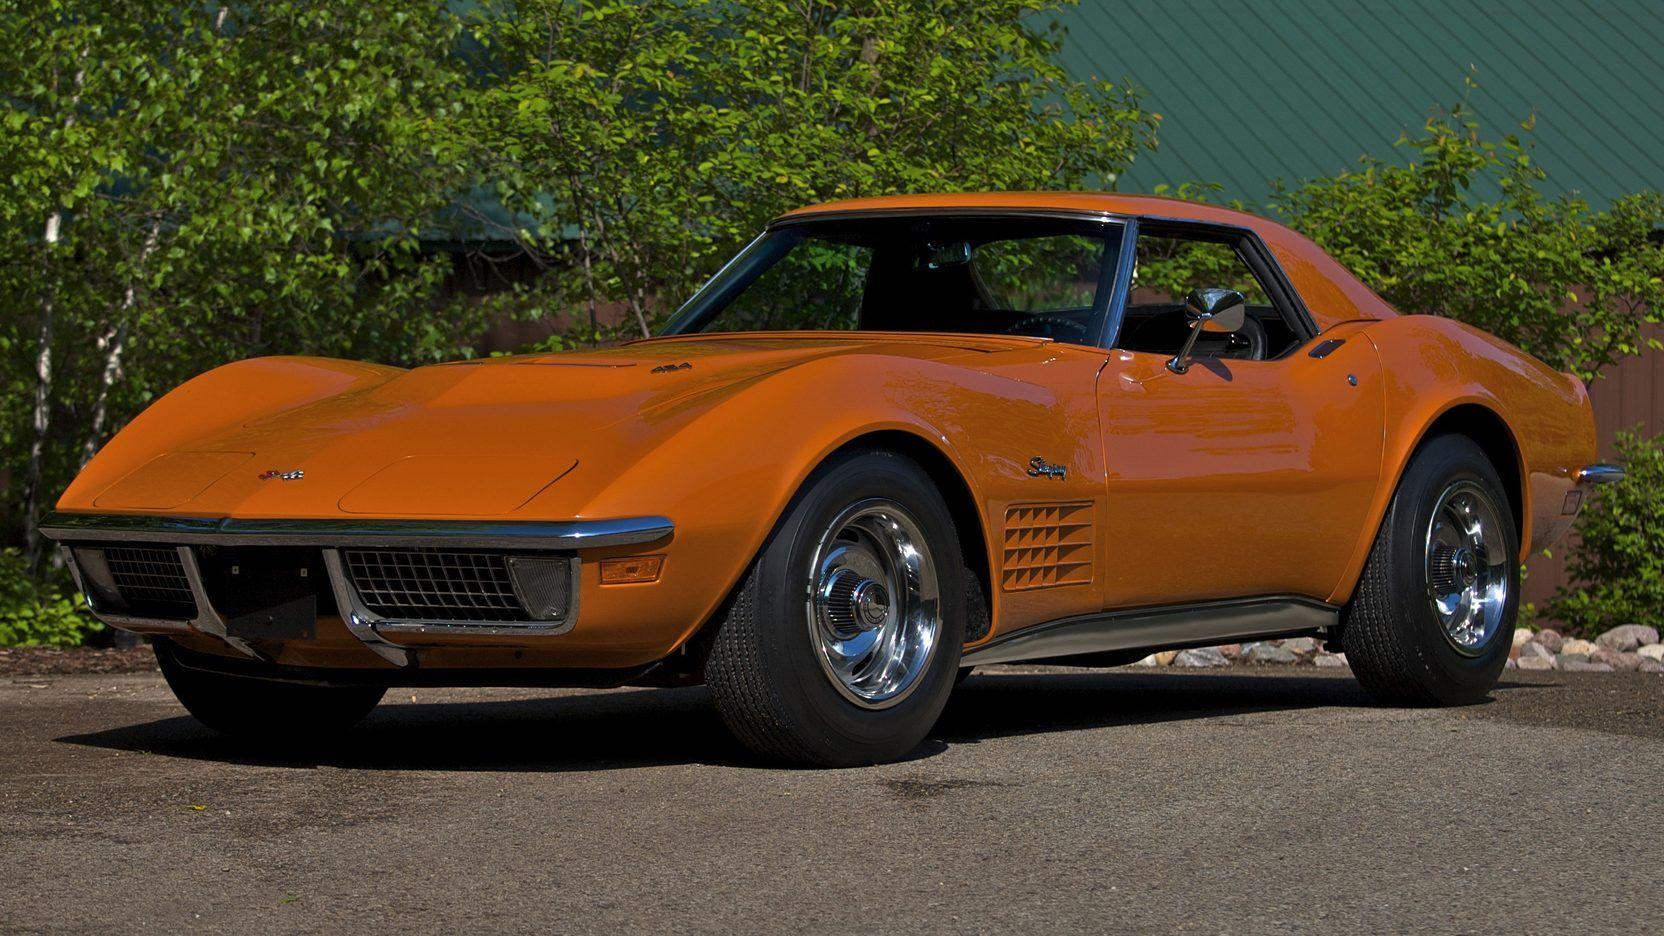 1971 Chevrolet Corvette ZR2 Convertible | GM - Chevrolet Corvette ...